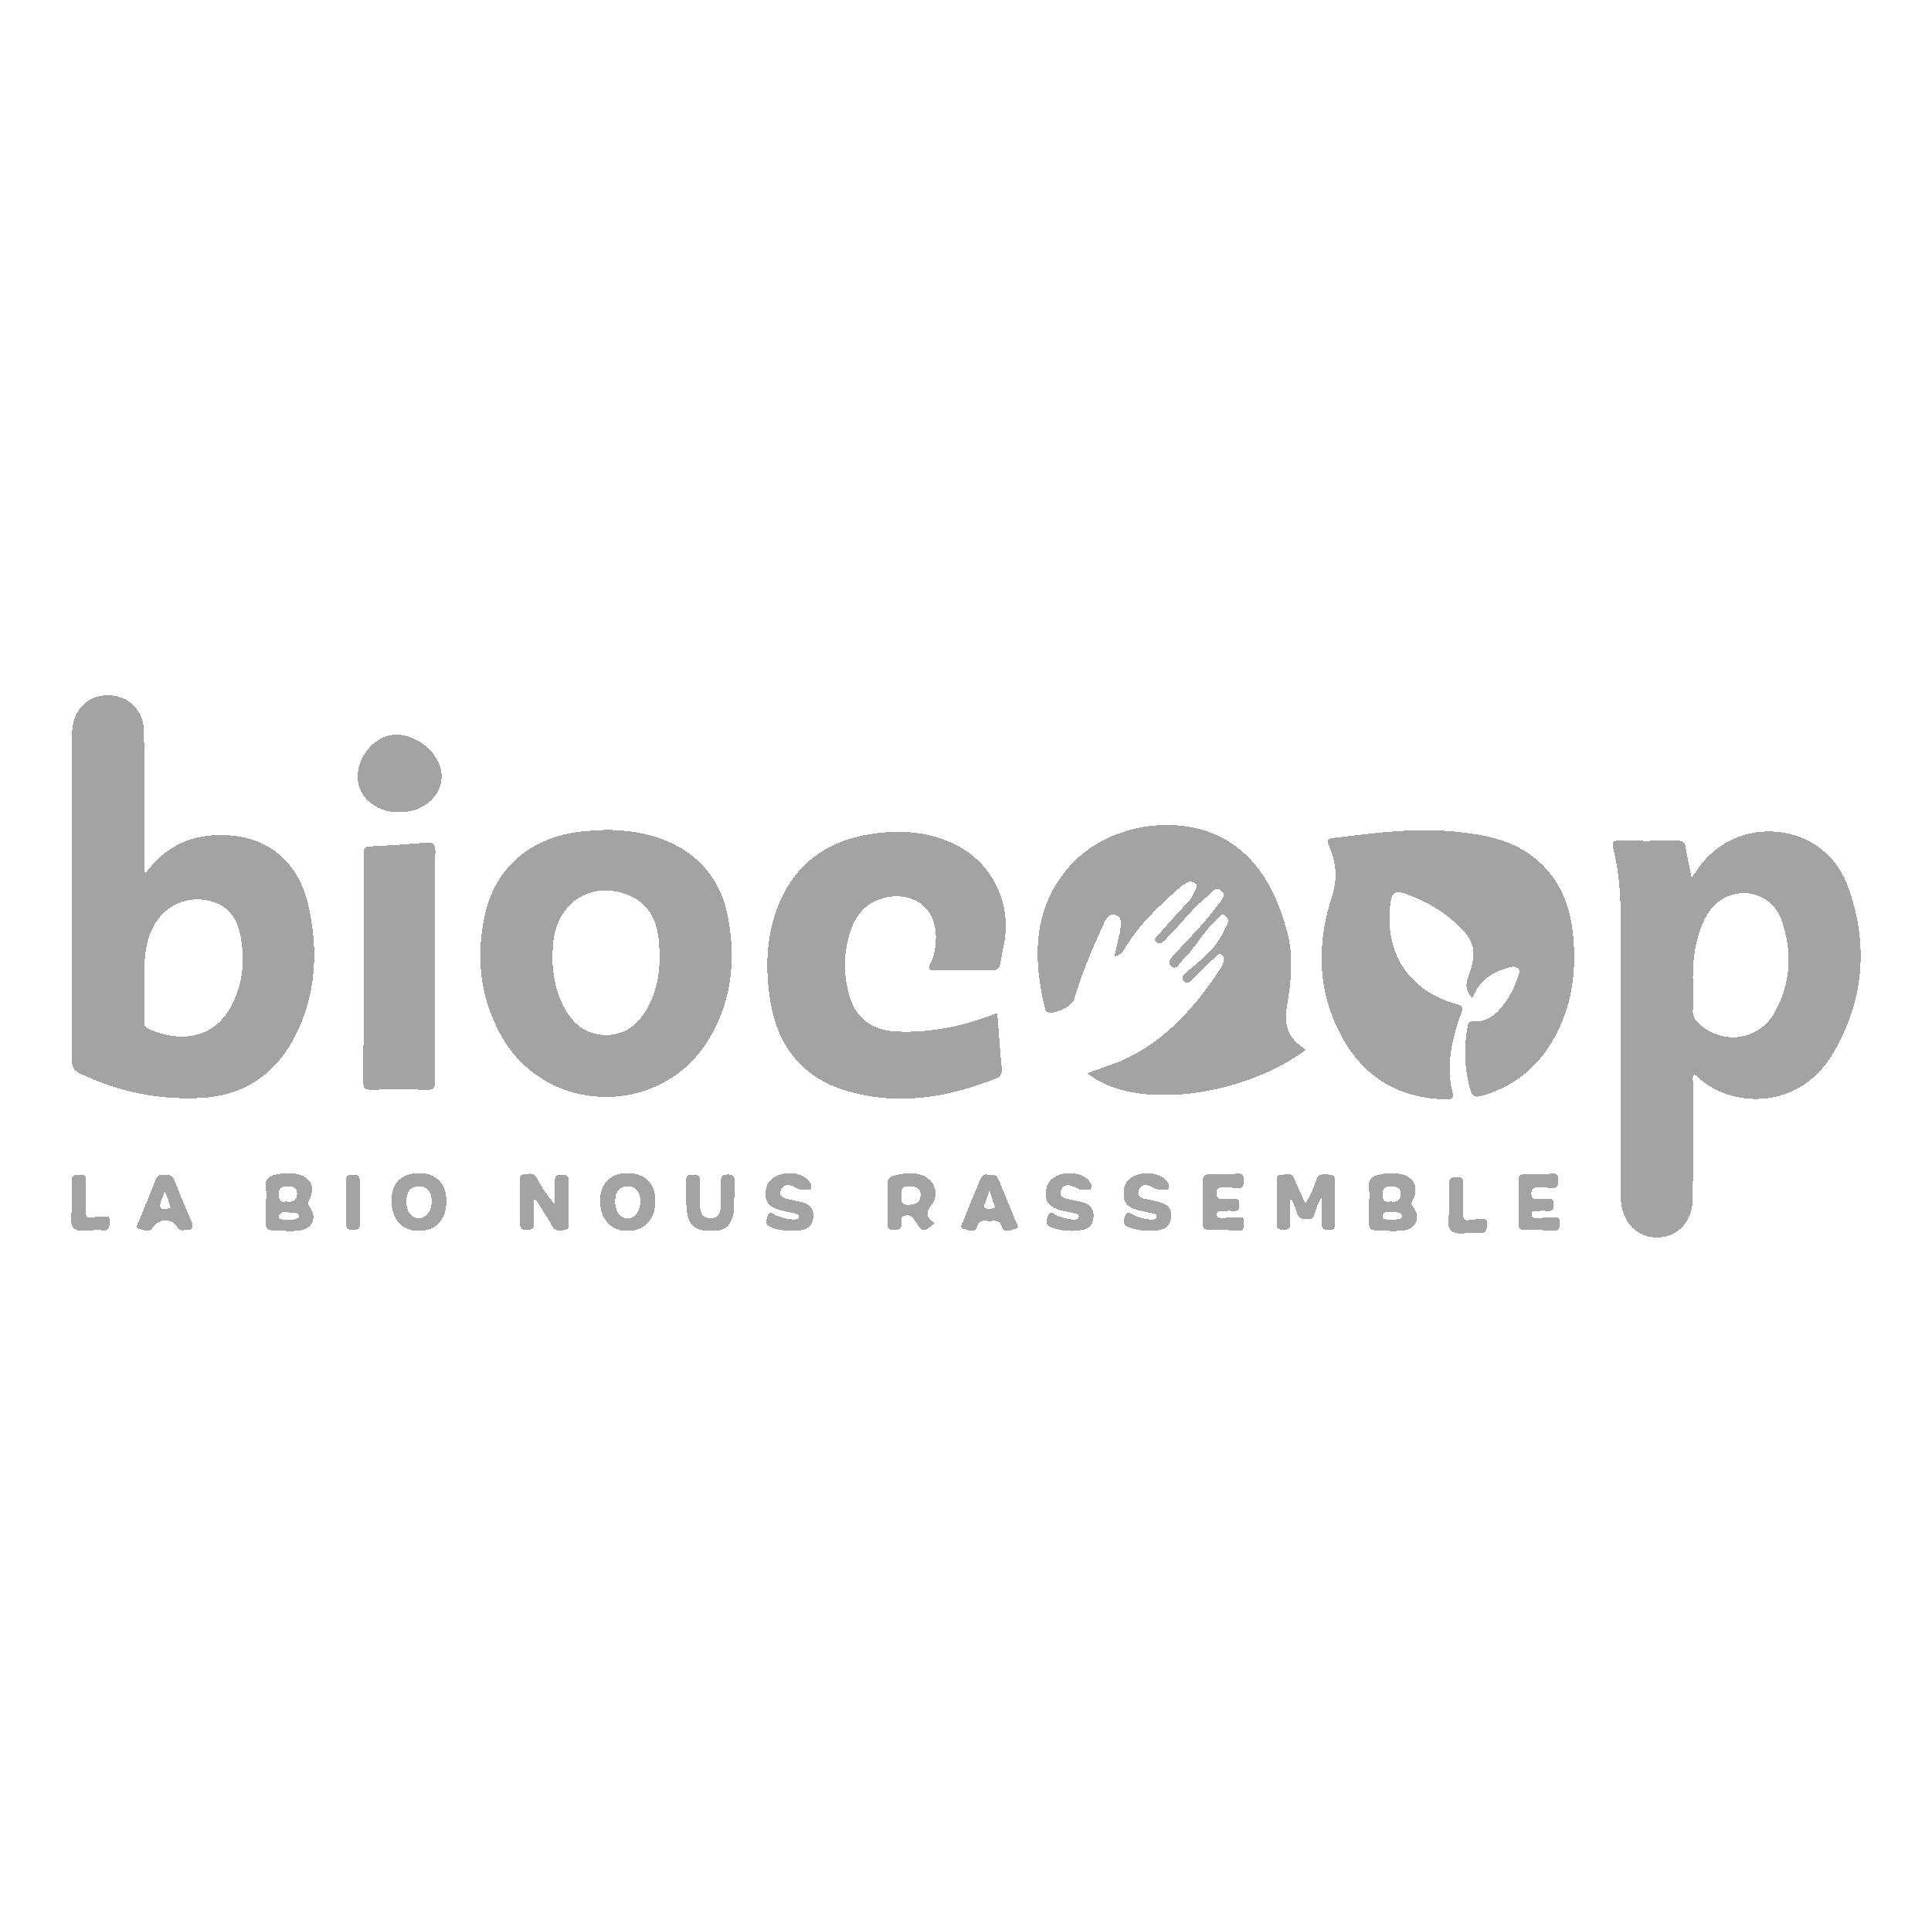 Breakout-company-agence-communication-logo-biocoop